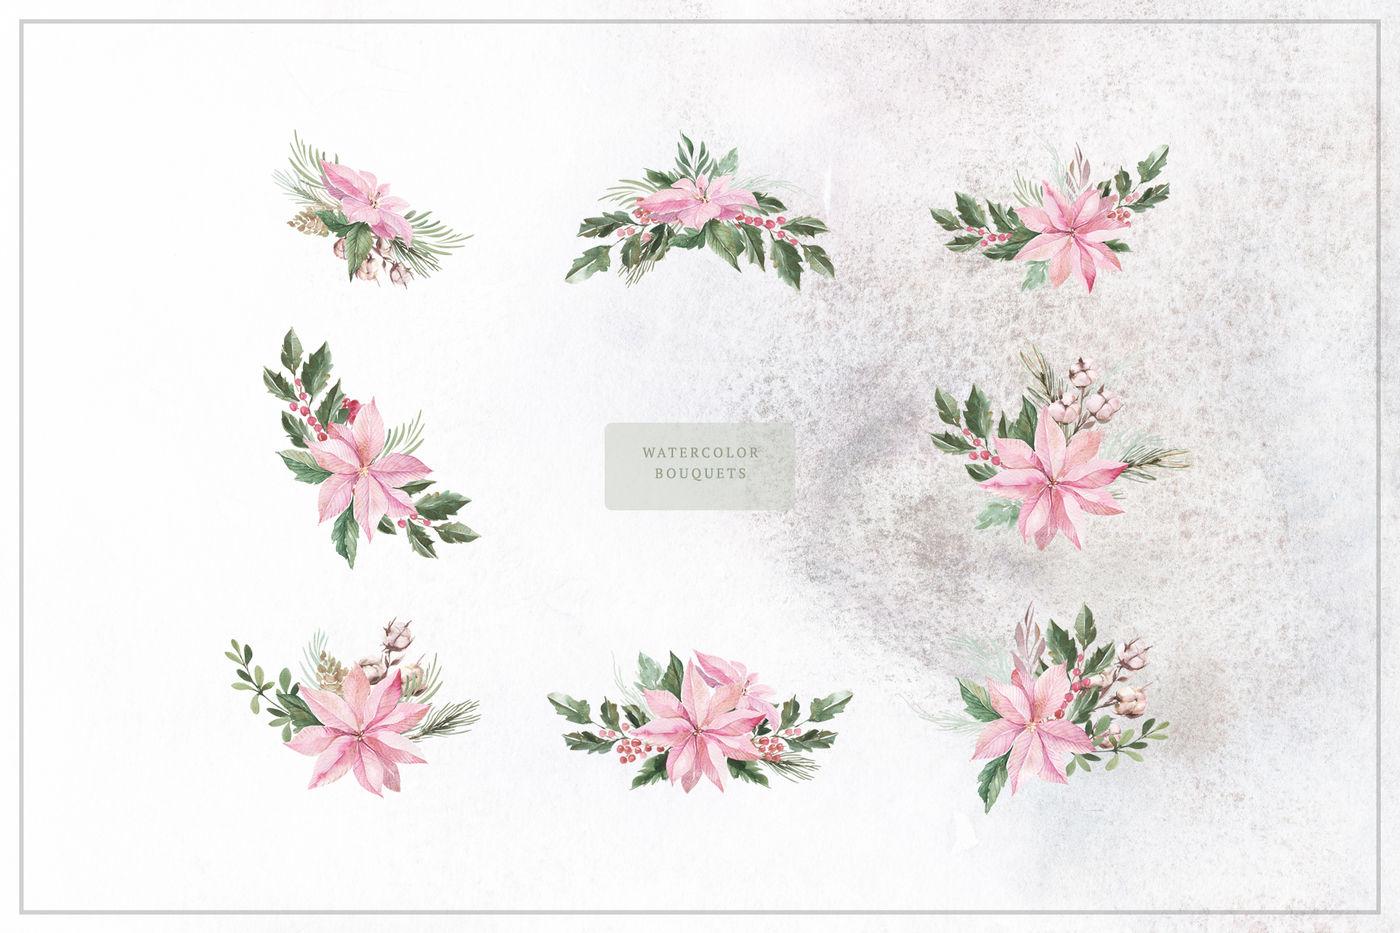 Watercolor Christmas Plants By Spasibenko Art Thehungryjpeg Com